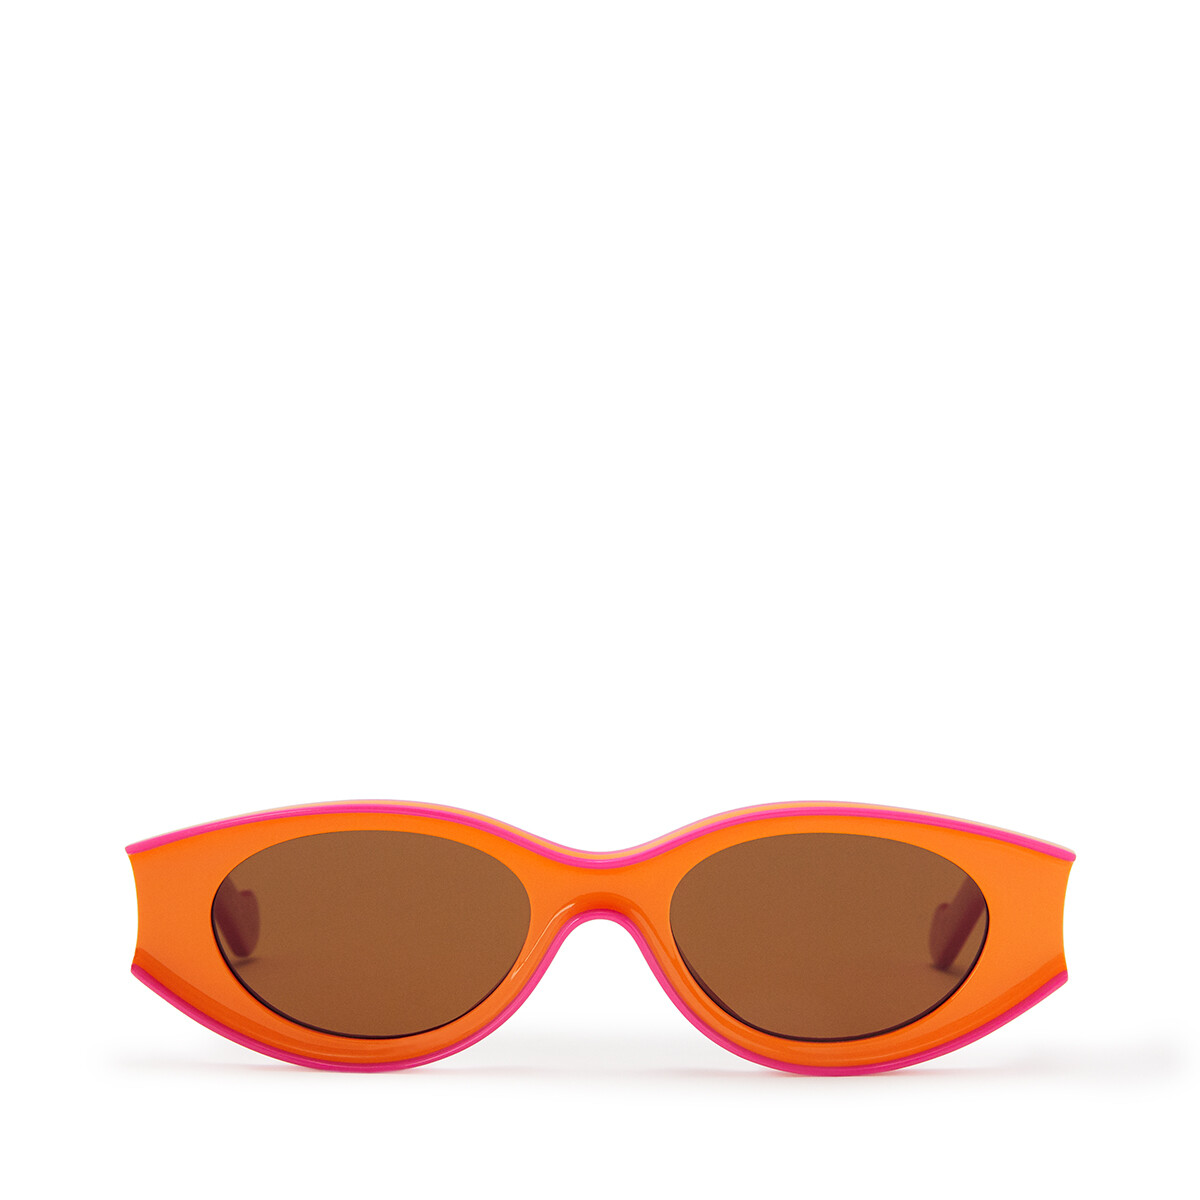 LOEWE 小号 Paula's 醋酸纤维太阳镜 Neon Orange/Neon Pink front